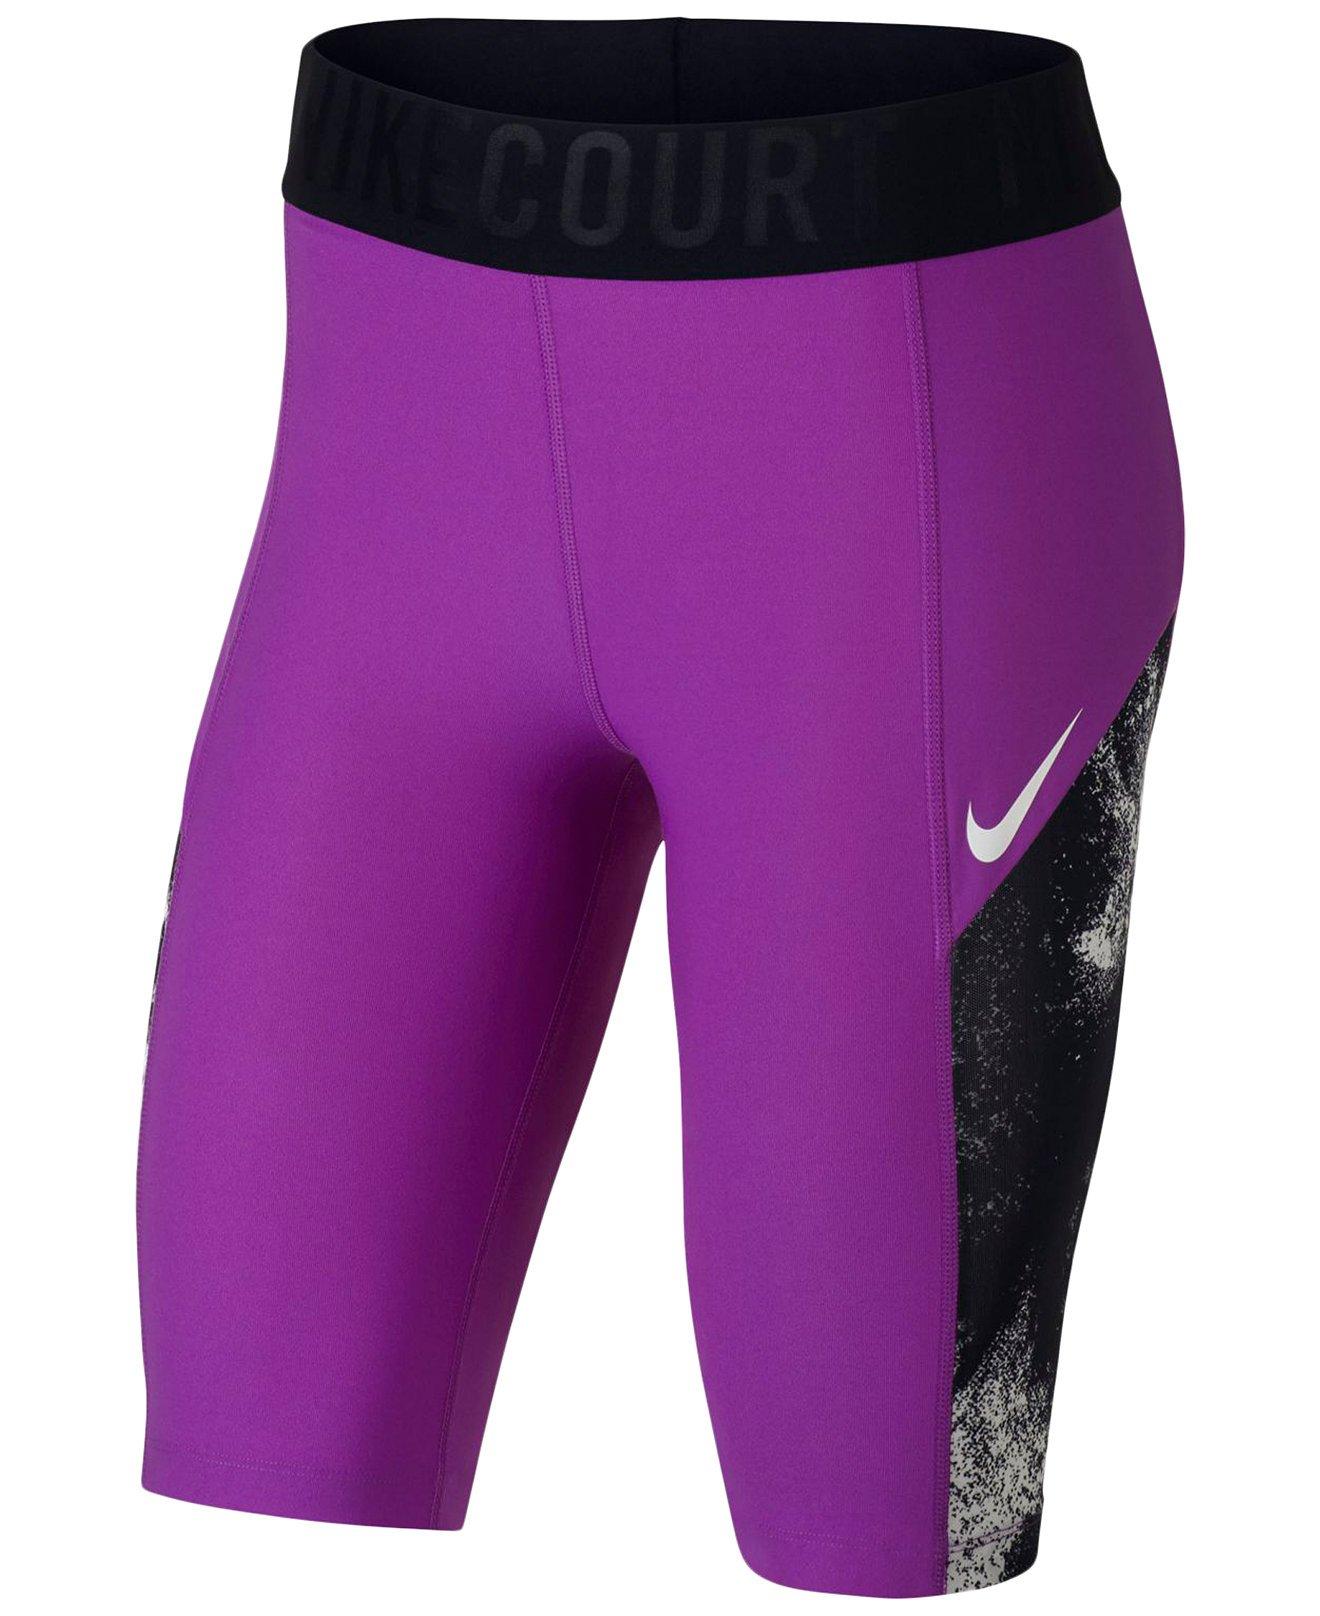 Nike Womens Power Graphic Printed Shorts Purple XS